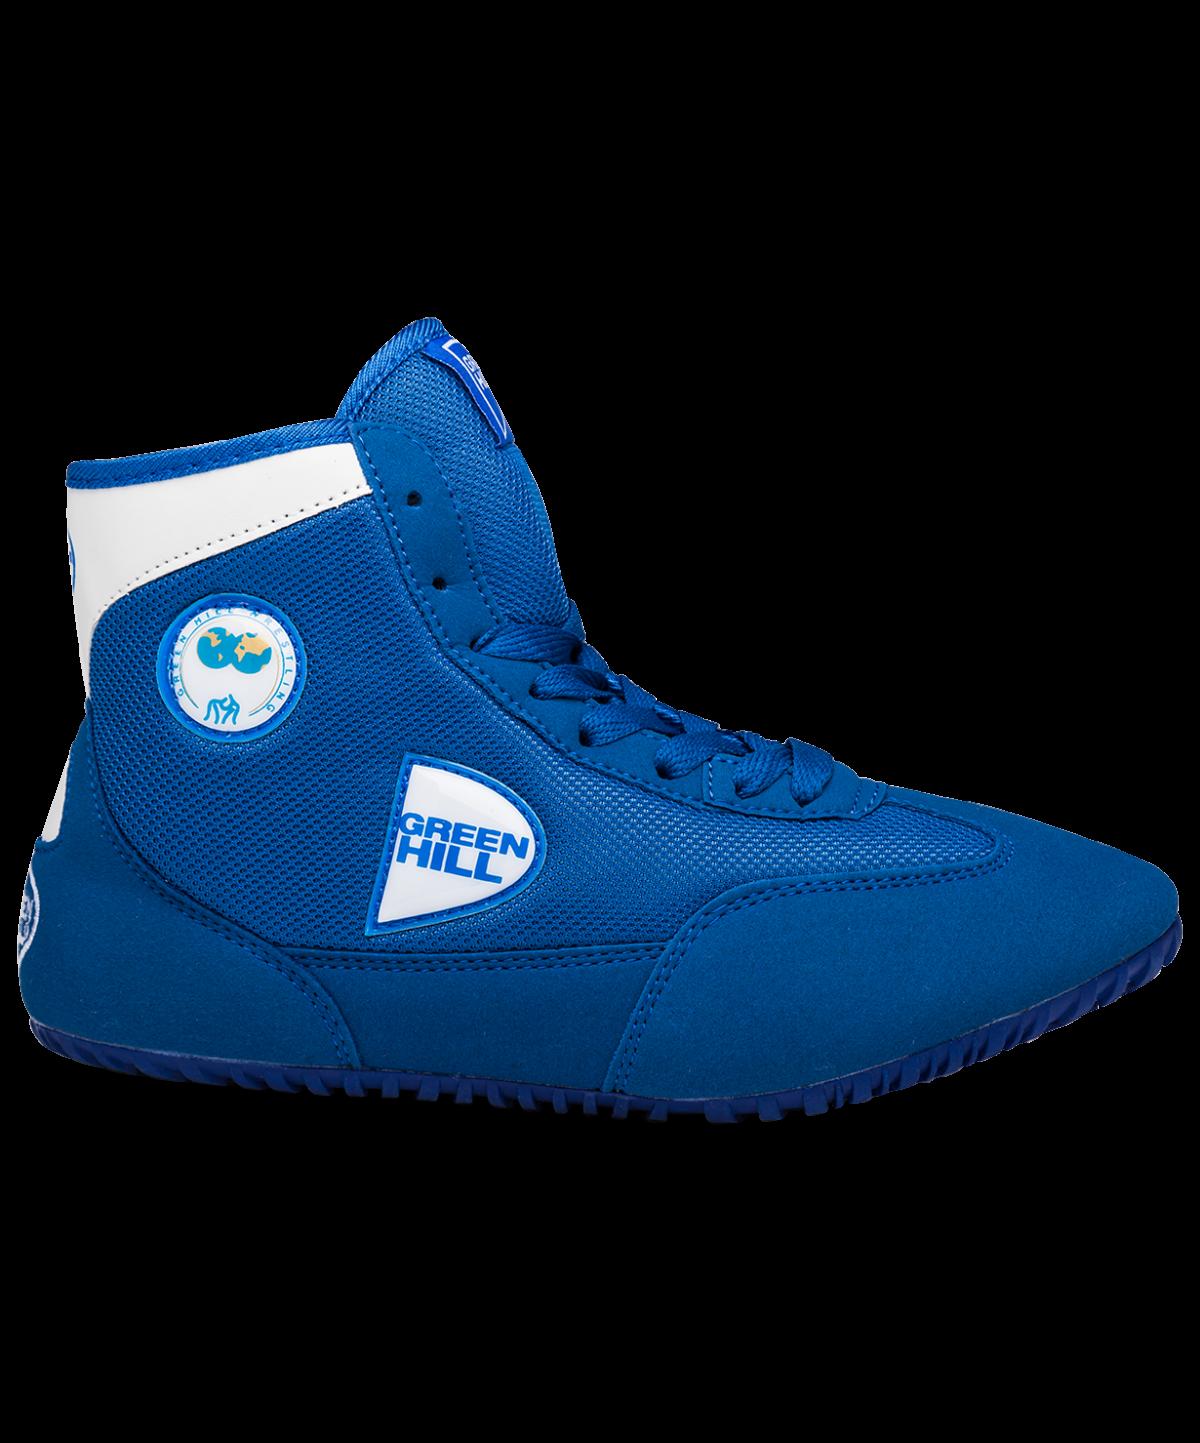 GREEN HILL Обувь для борьбы  GWB-3052/GWB-3055: синий/белый - 3